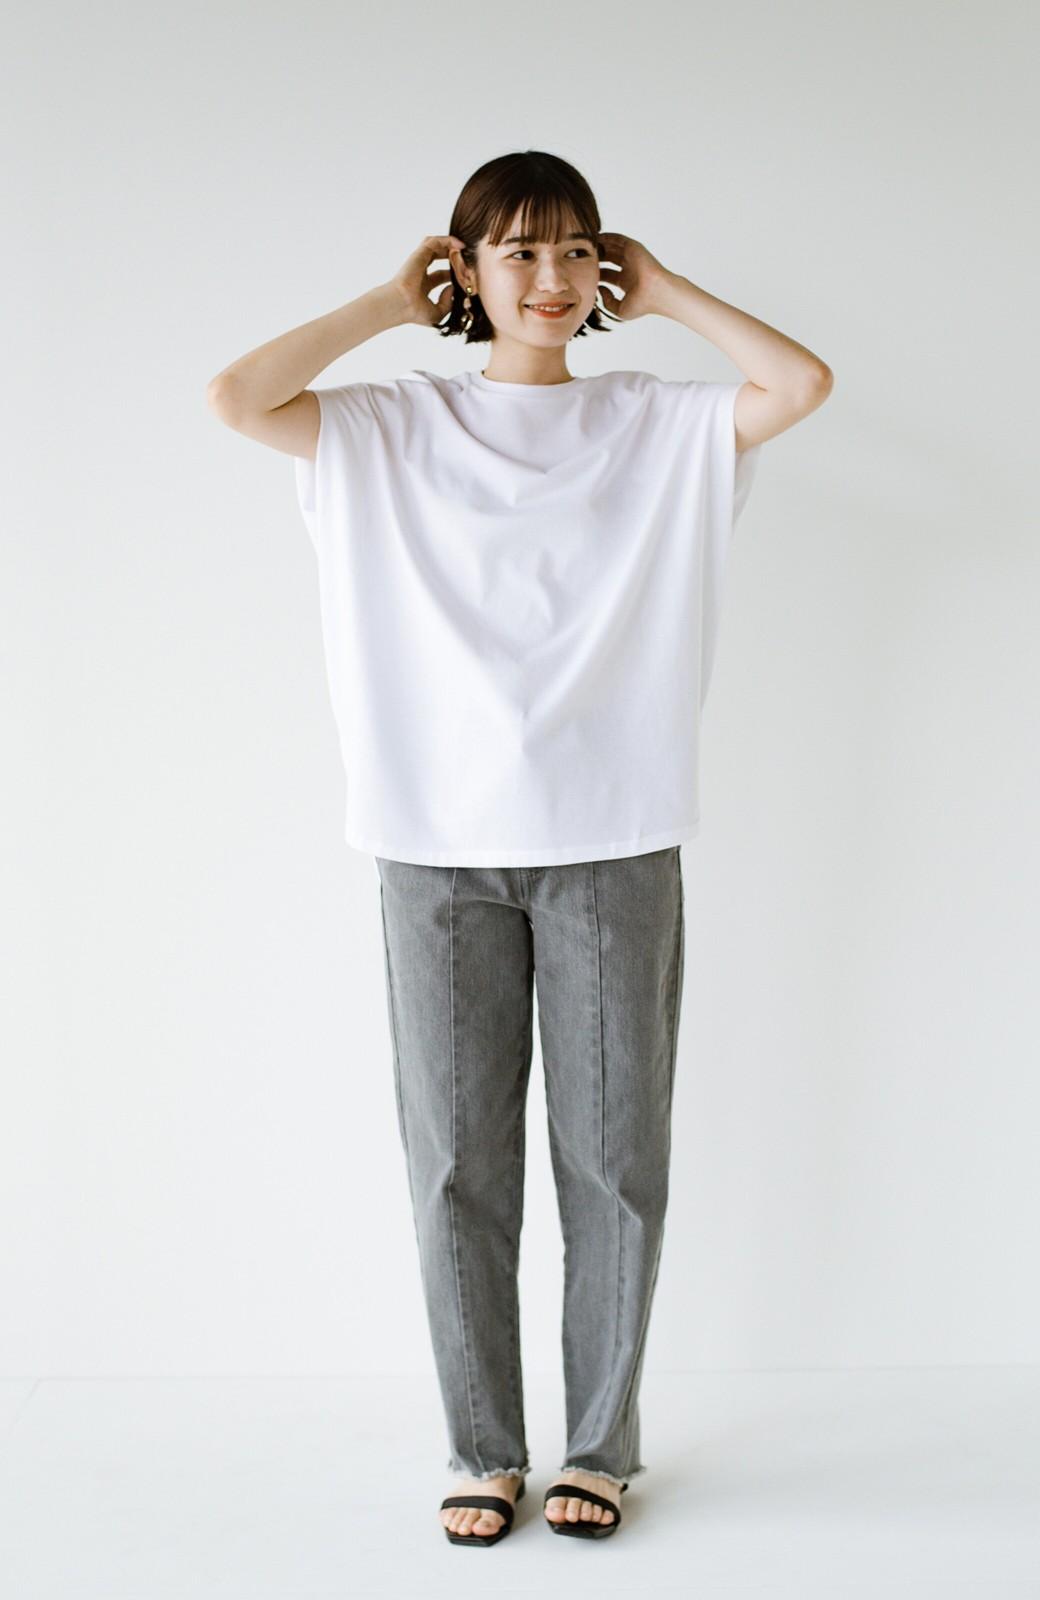 haco! PBPオーガニックコットン 楽ちんなのにブラウス気分で着られる大人のおめかしTシャツ <ホワイト>の商品写真9